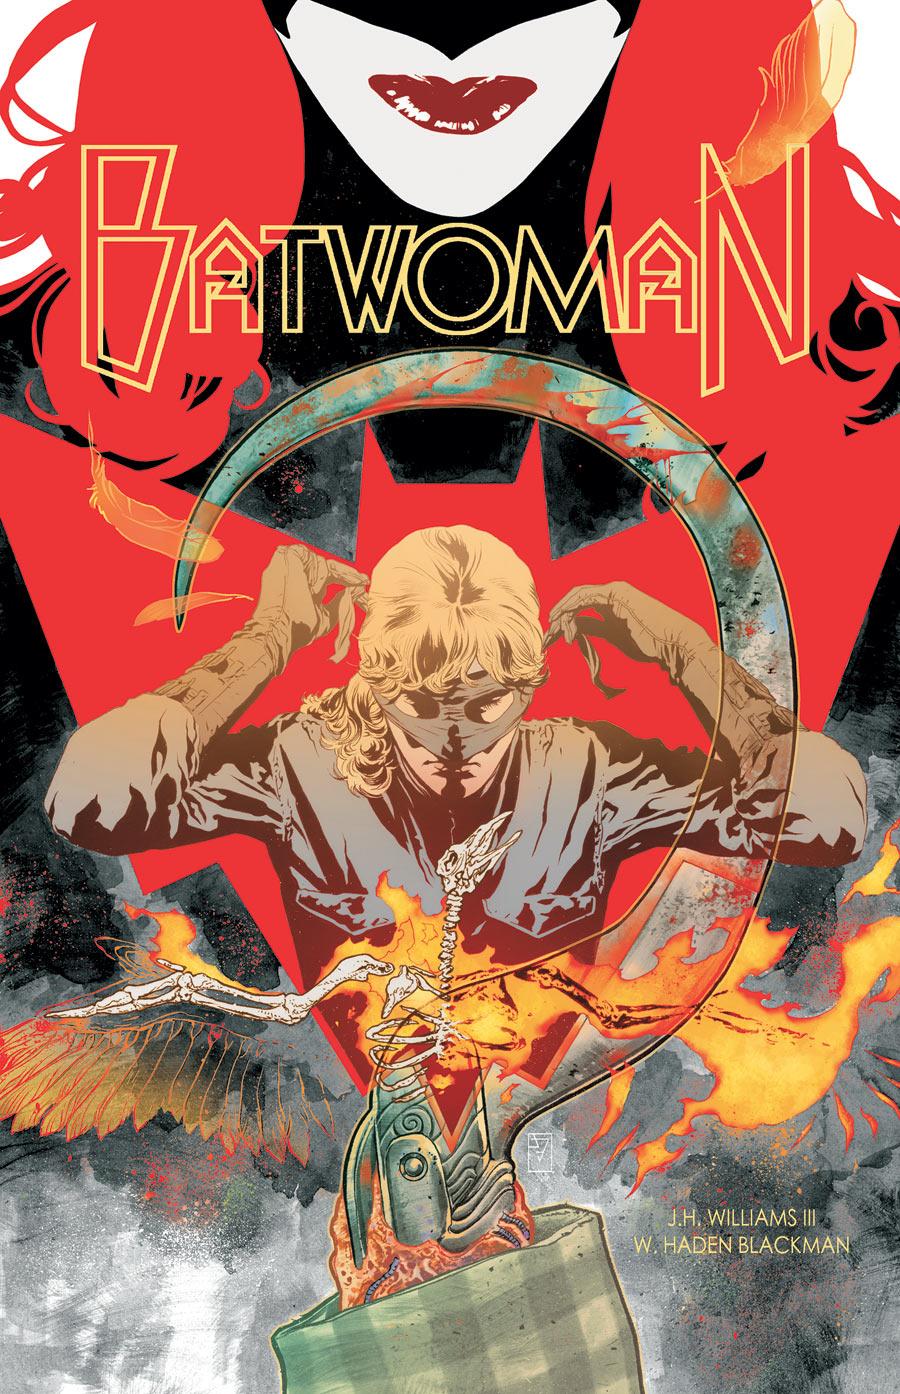 Batwoman New 52 Vol 2 File:batwoman Vol 2 4